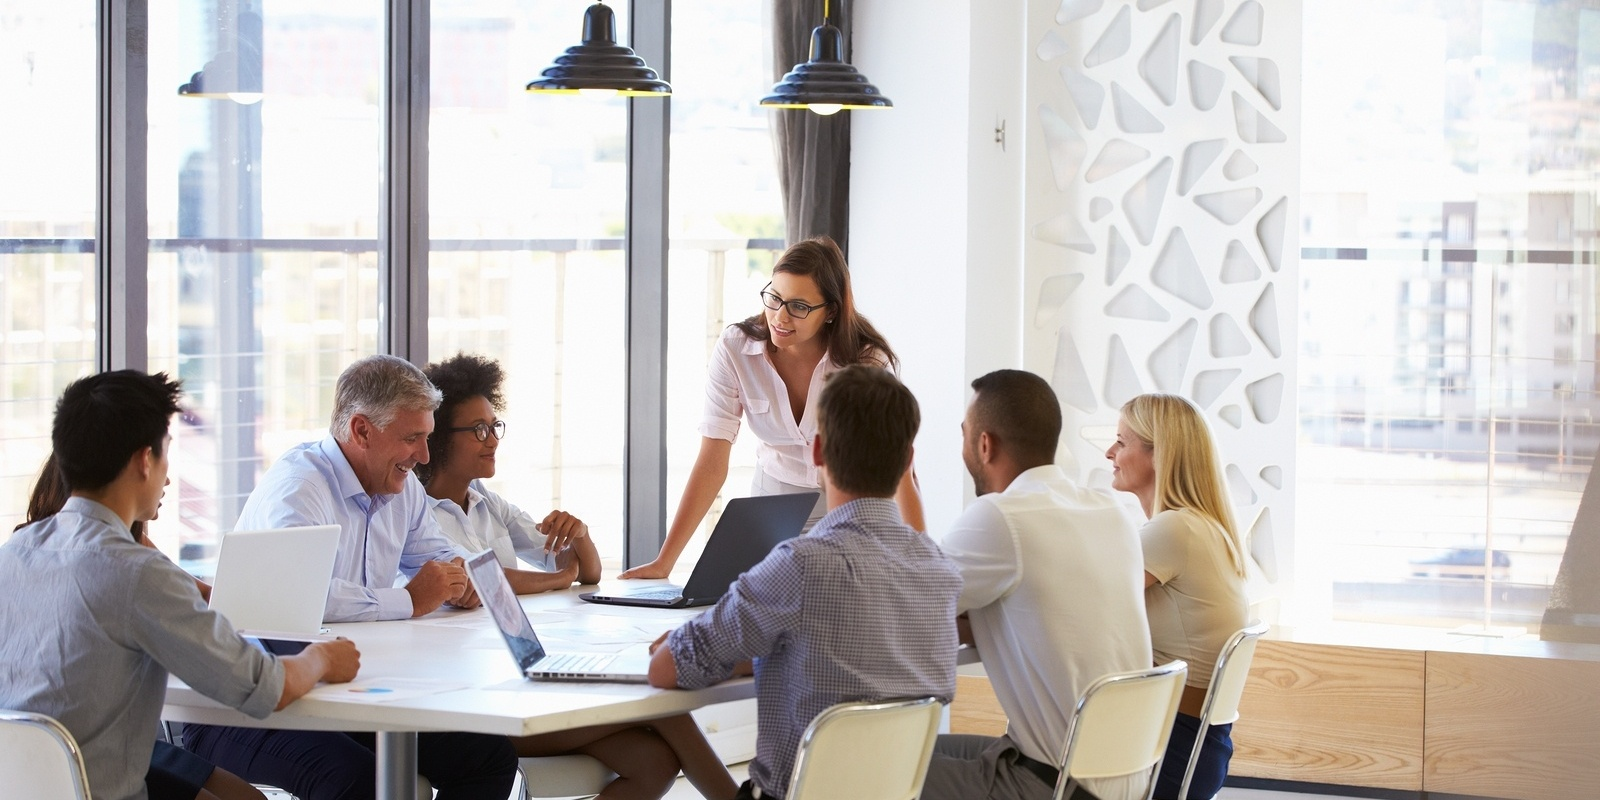 bigstock-Businesswoman-presenting-to-co-90005582-045180-edited.jpg